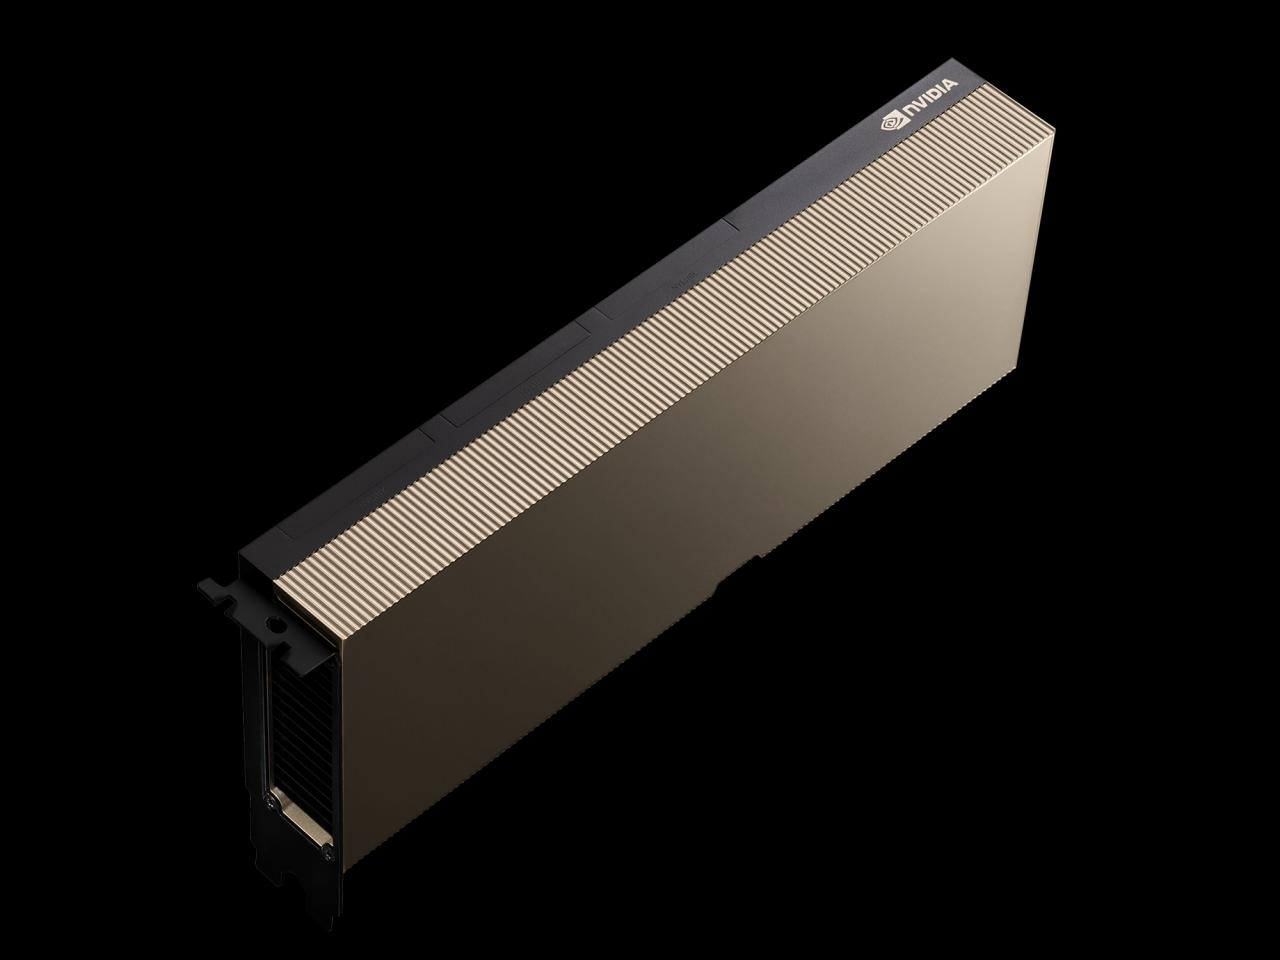 NVIDIA Readies Ampere A100 PCIe GPU With 80 GB HBM2e Memory & Up To 2 TB/s Bandwidth